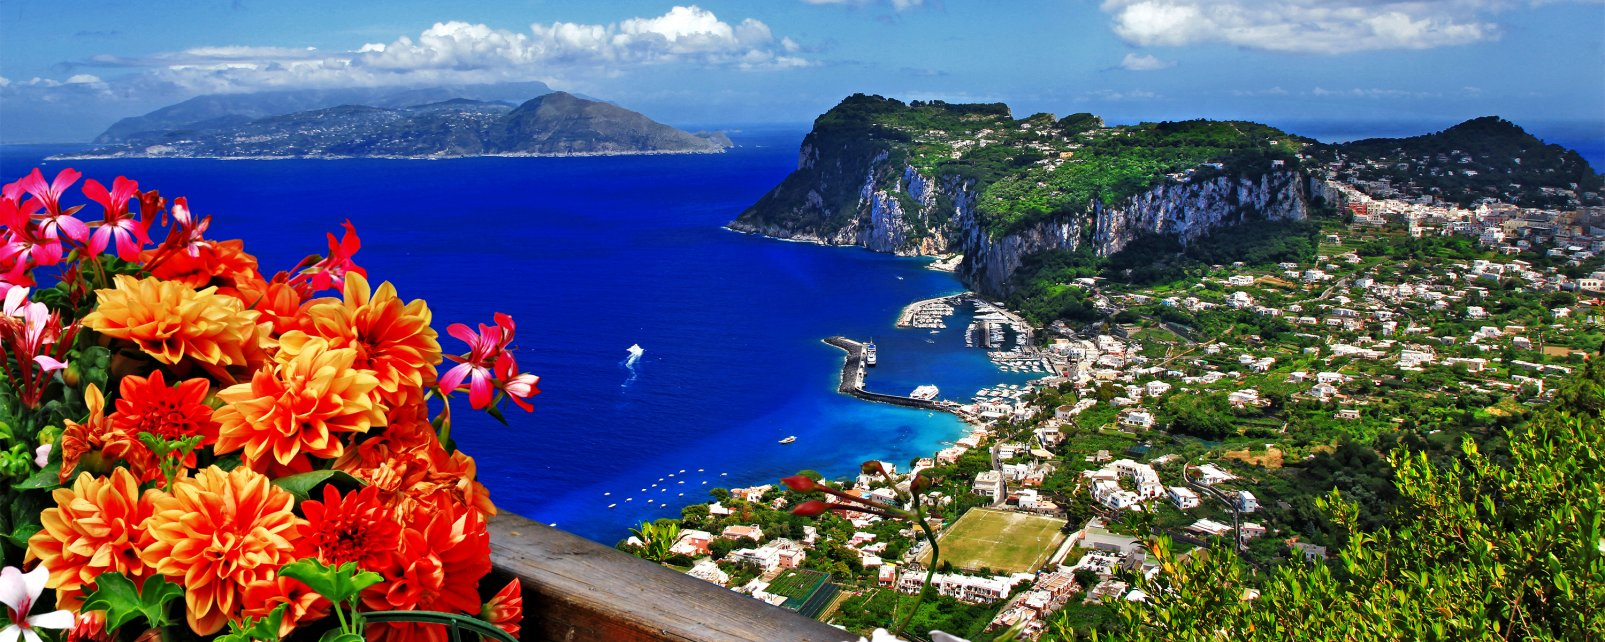 Capri, Campanie, Italie,